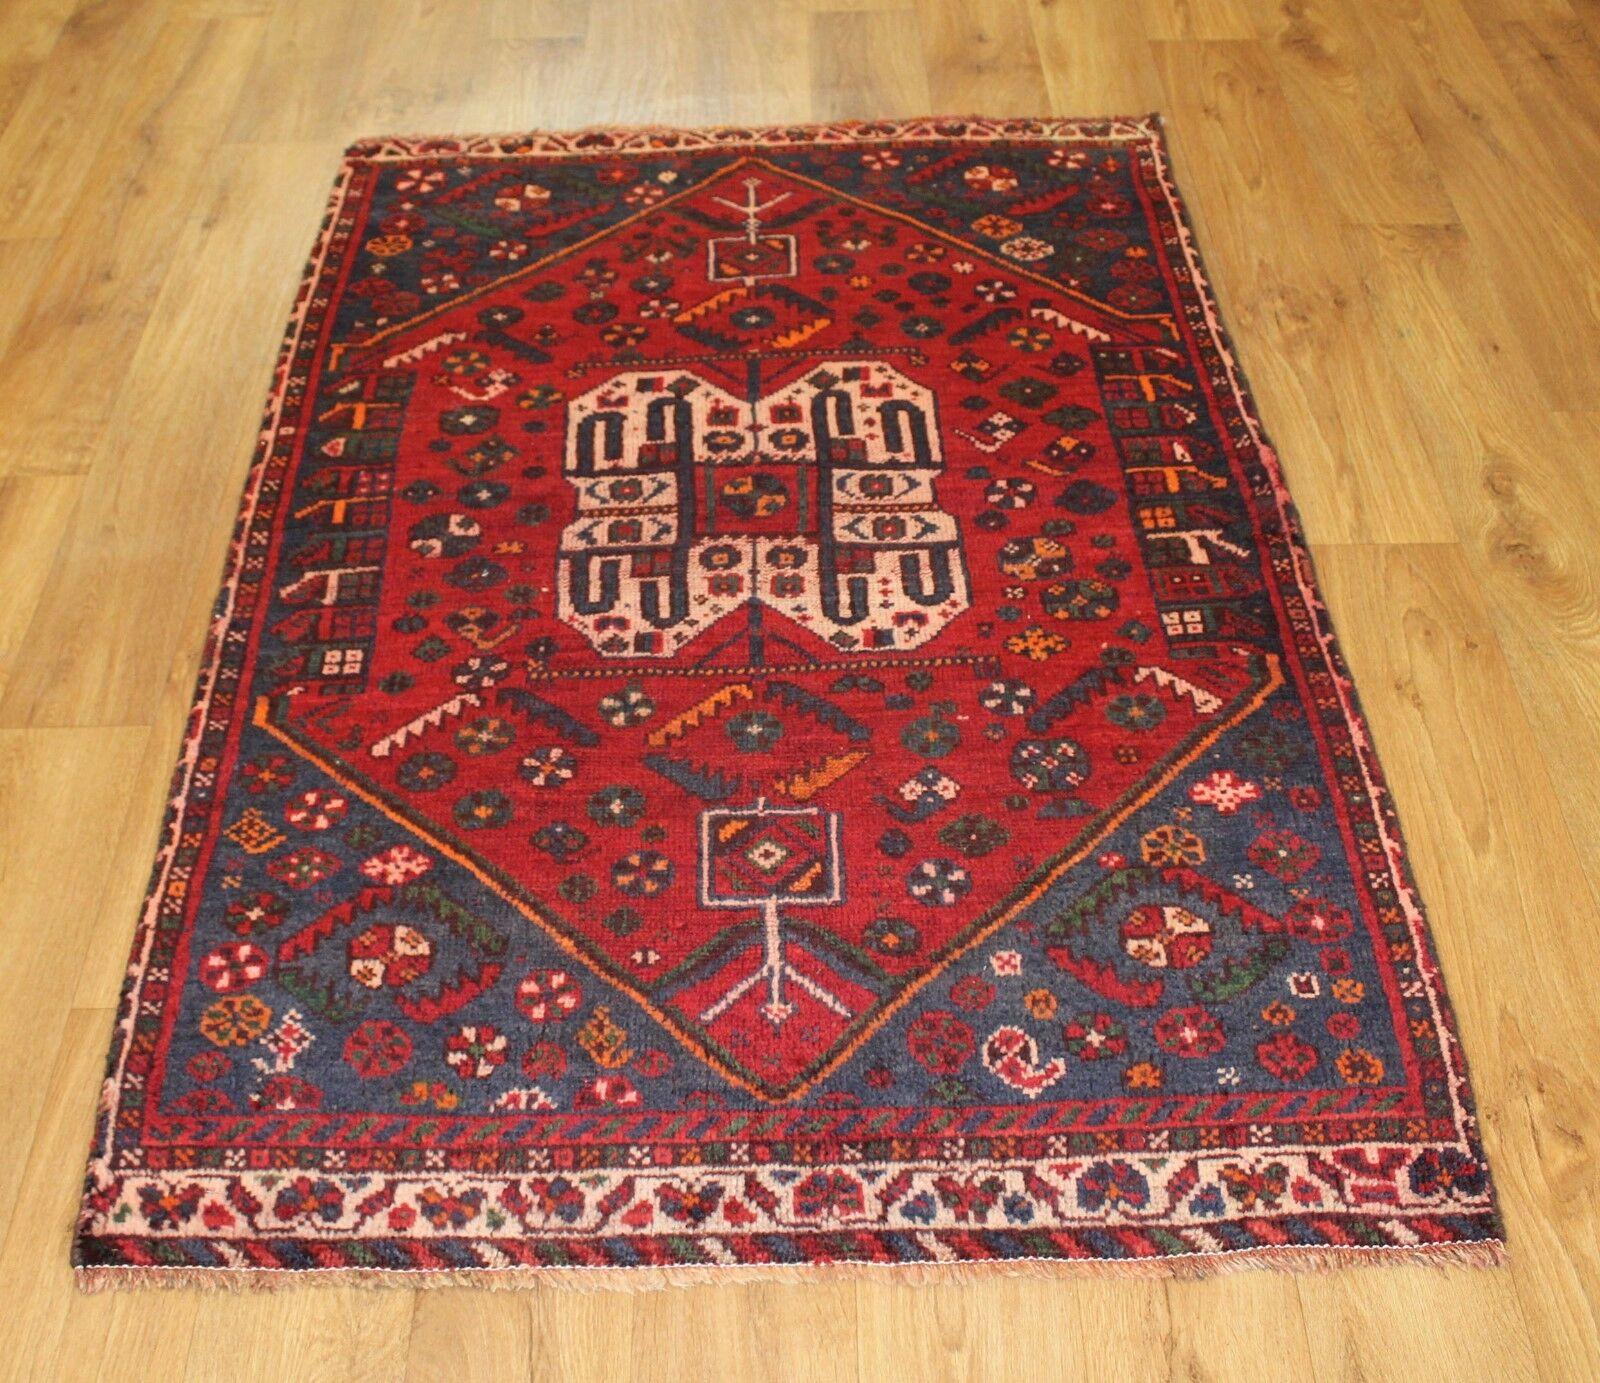 Traditional Vintage Wool Wool Wool Handmade Classic Oriental Area Rug Carpet 150X 98cm bd20a8